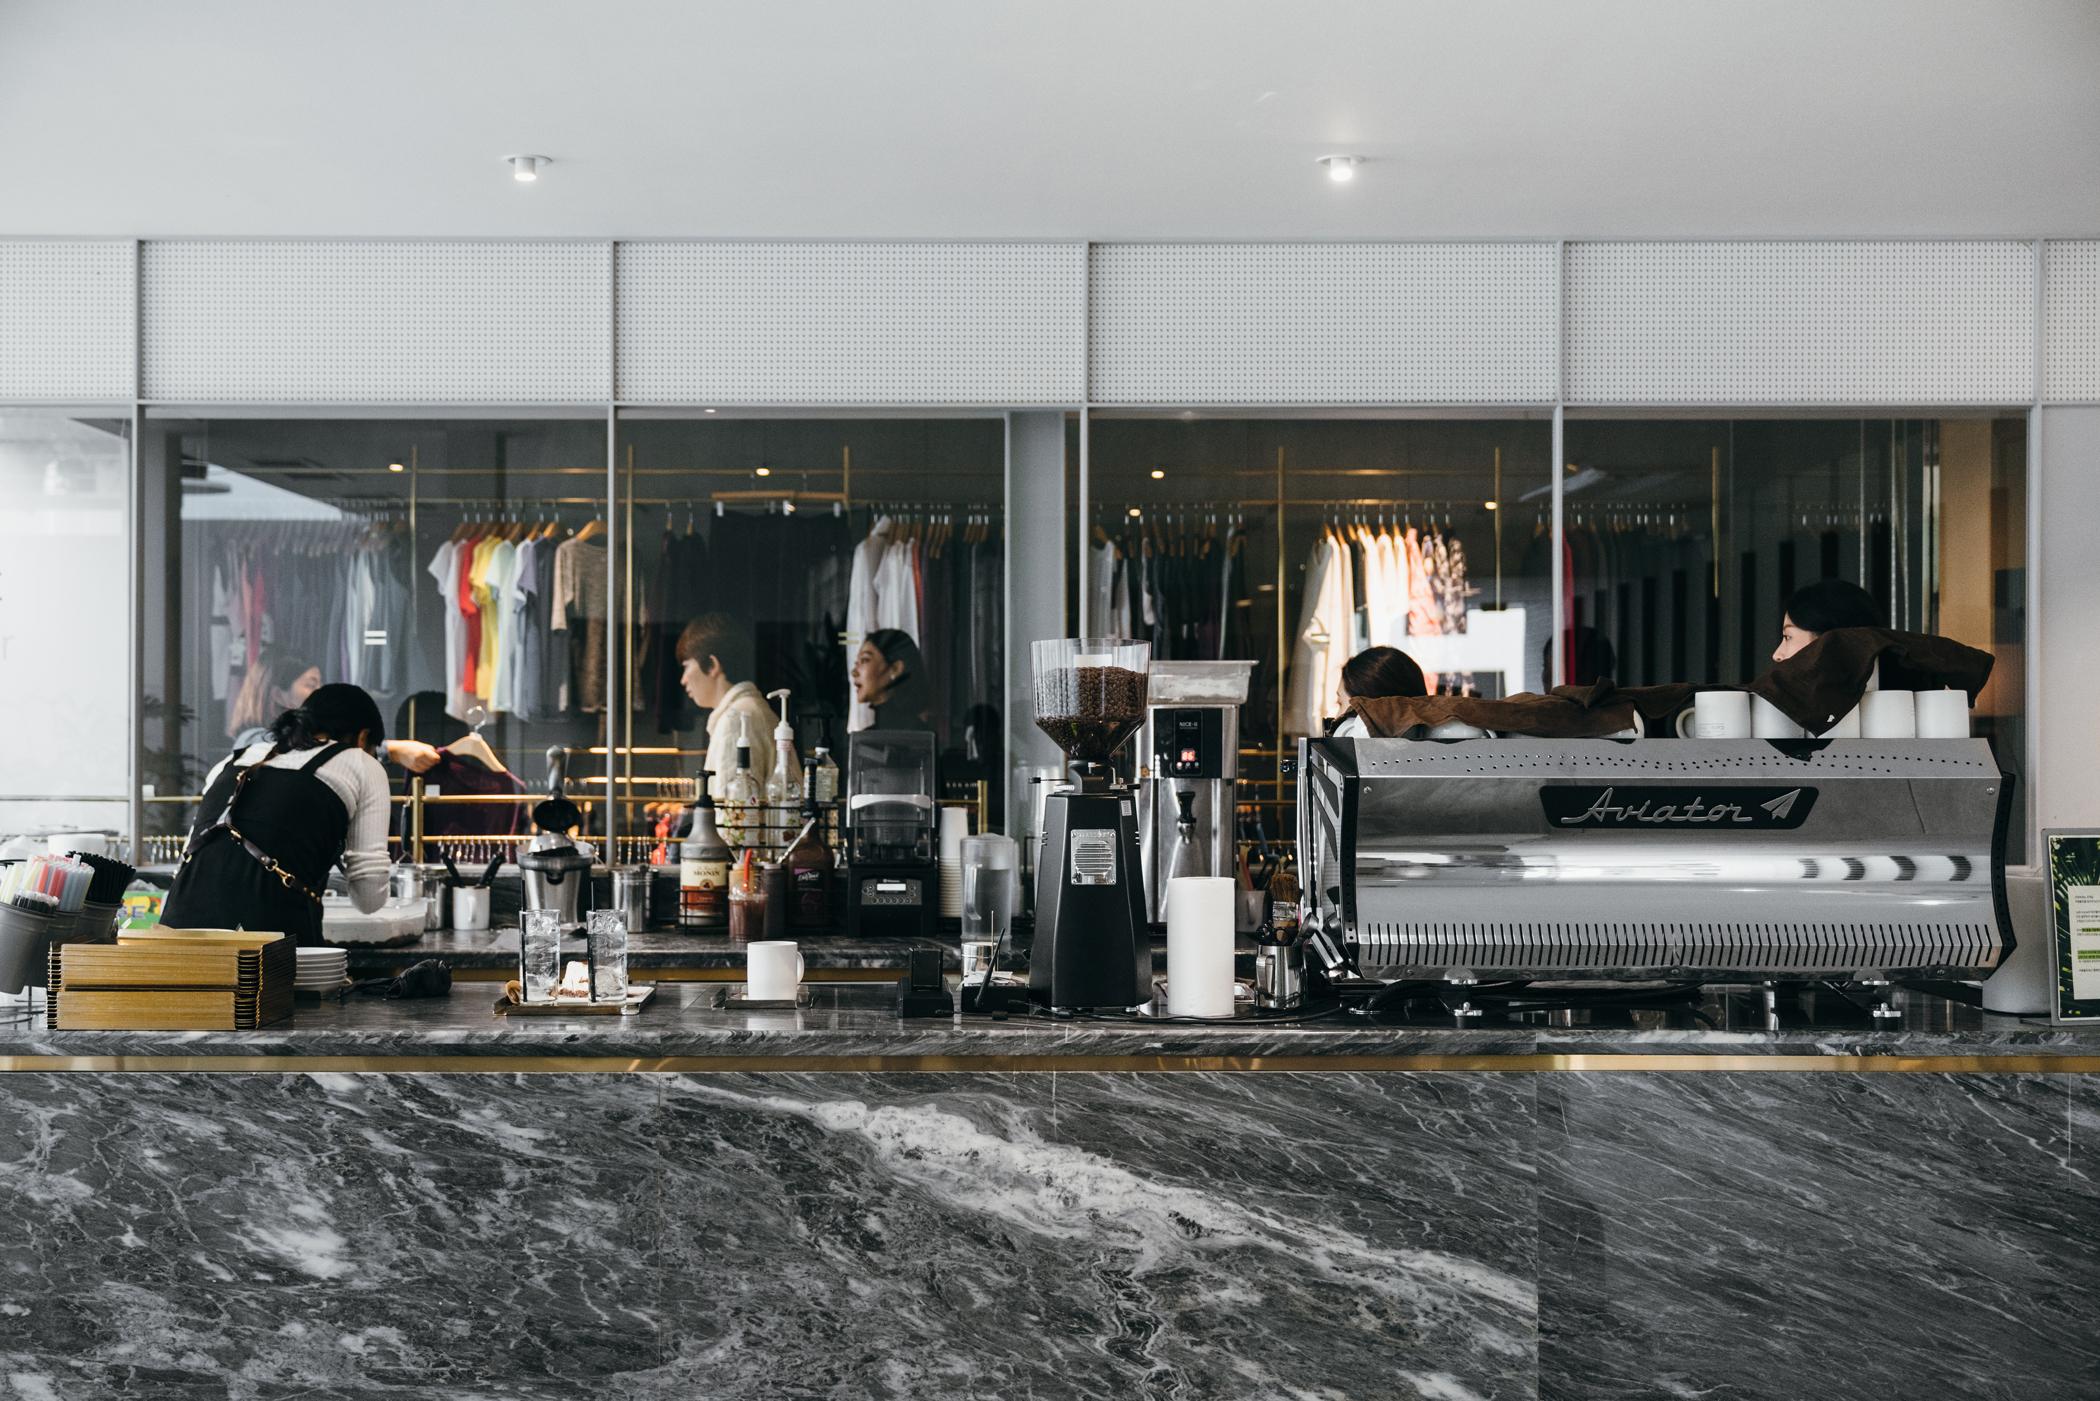 Greysuitcase Seoul Cafe Series: Cafe Mula (카페 뮬라), Garosugil (가로수길), Seoul, South Korea.